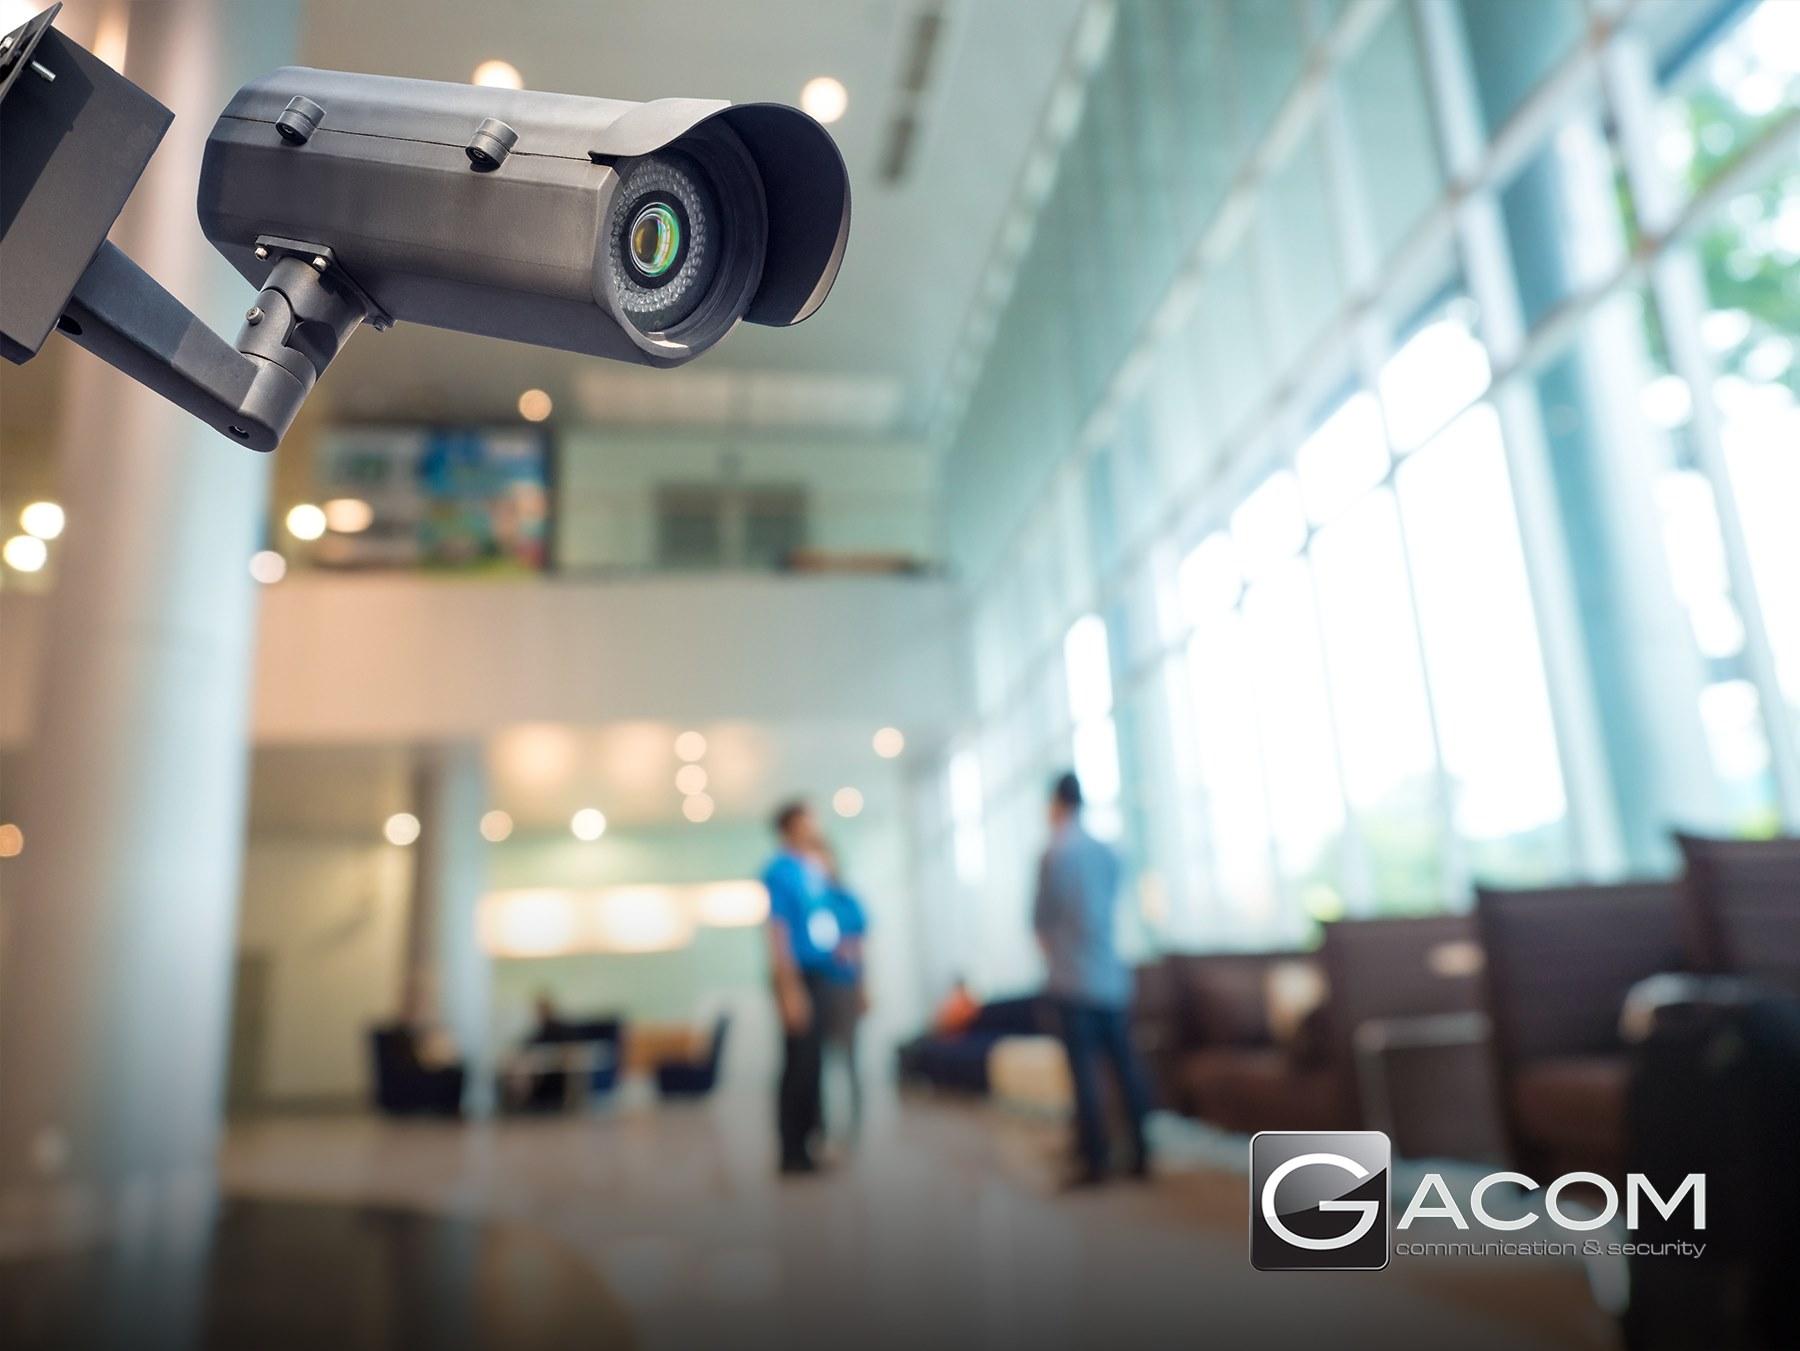 Gacom_security and communication_Veghel